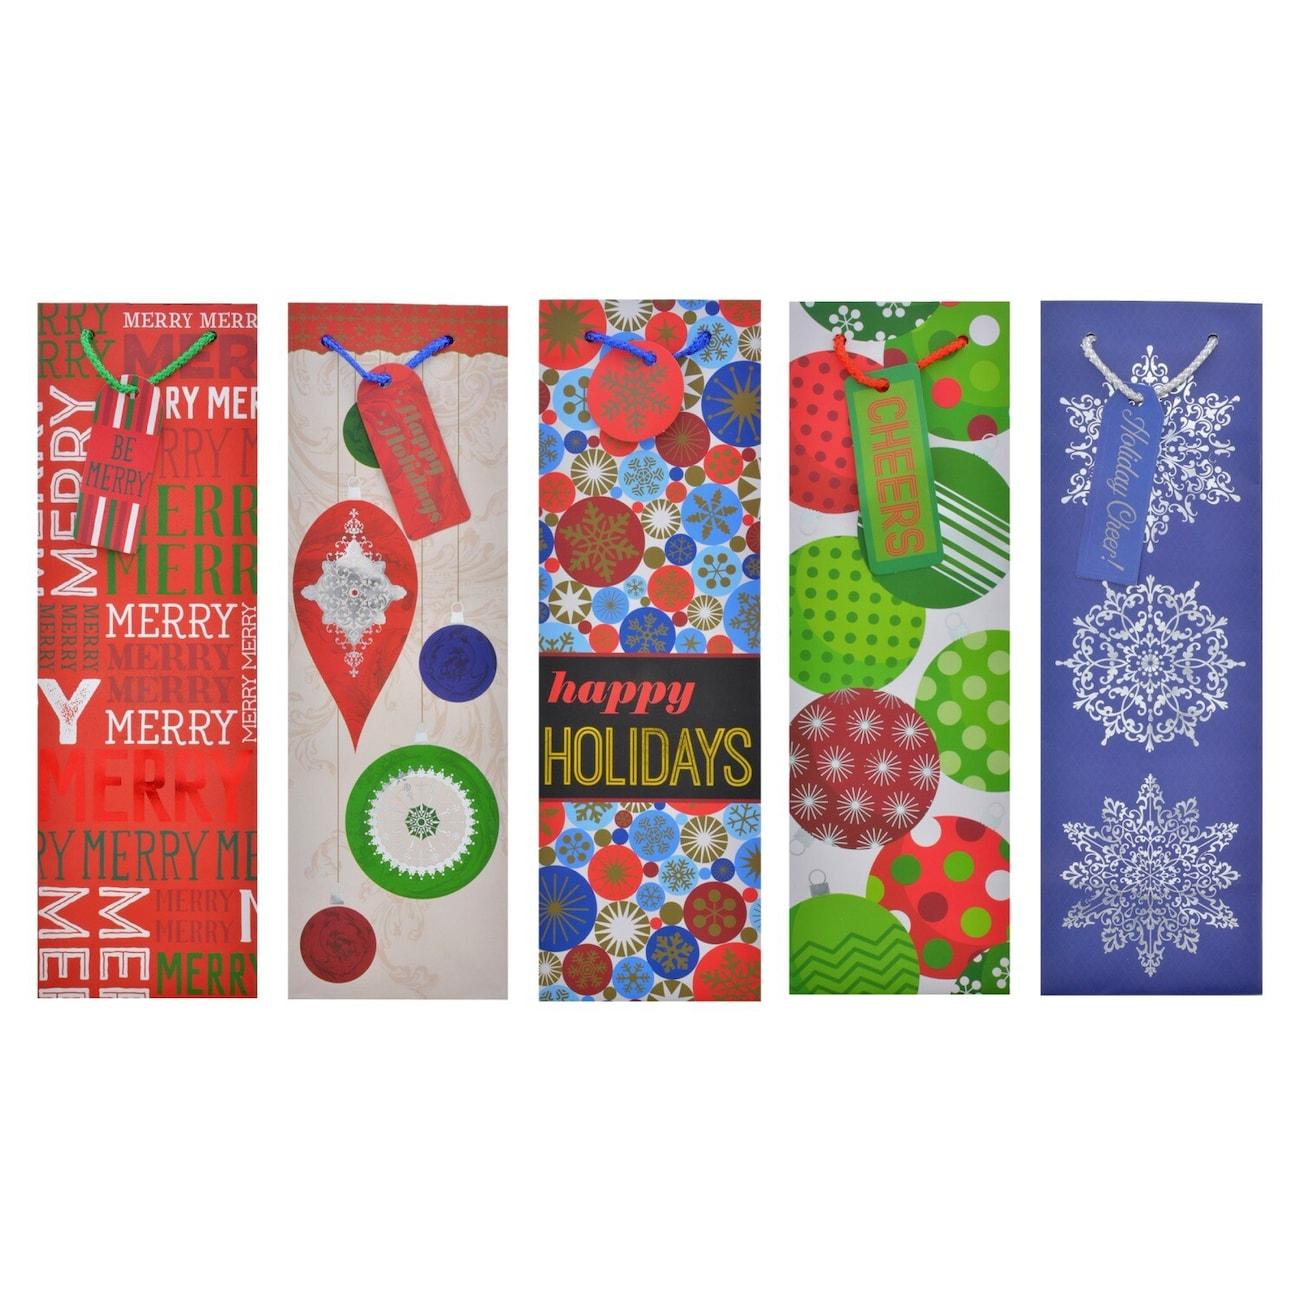 Christmas Bottle Gift Bags - Dollar Tree, Inc.